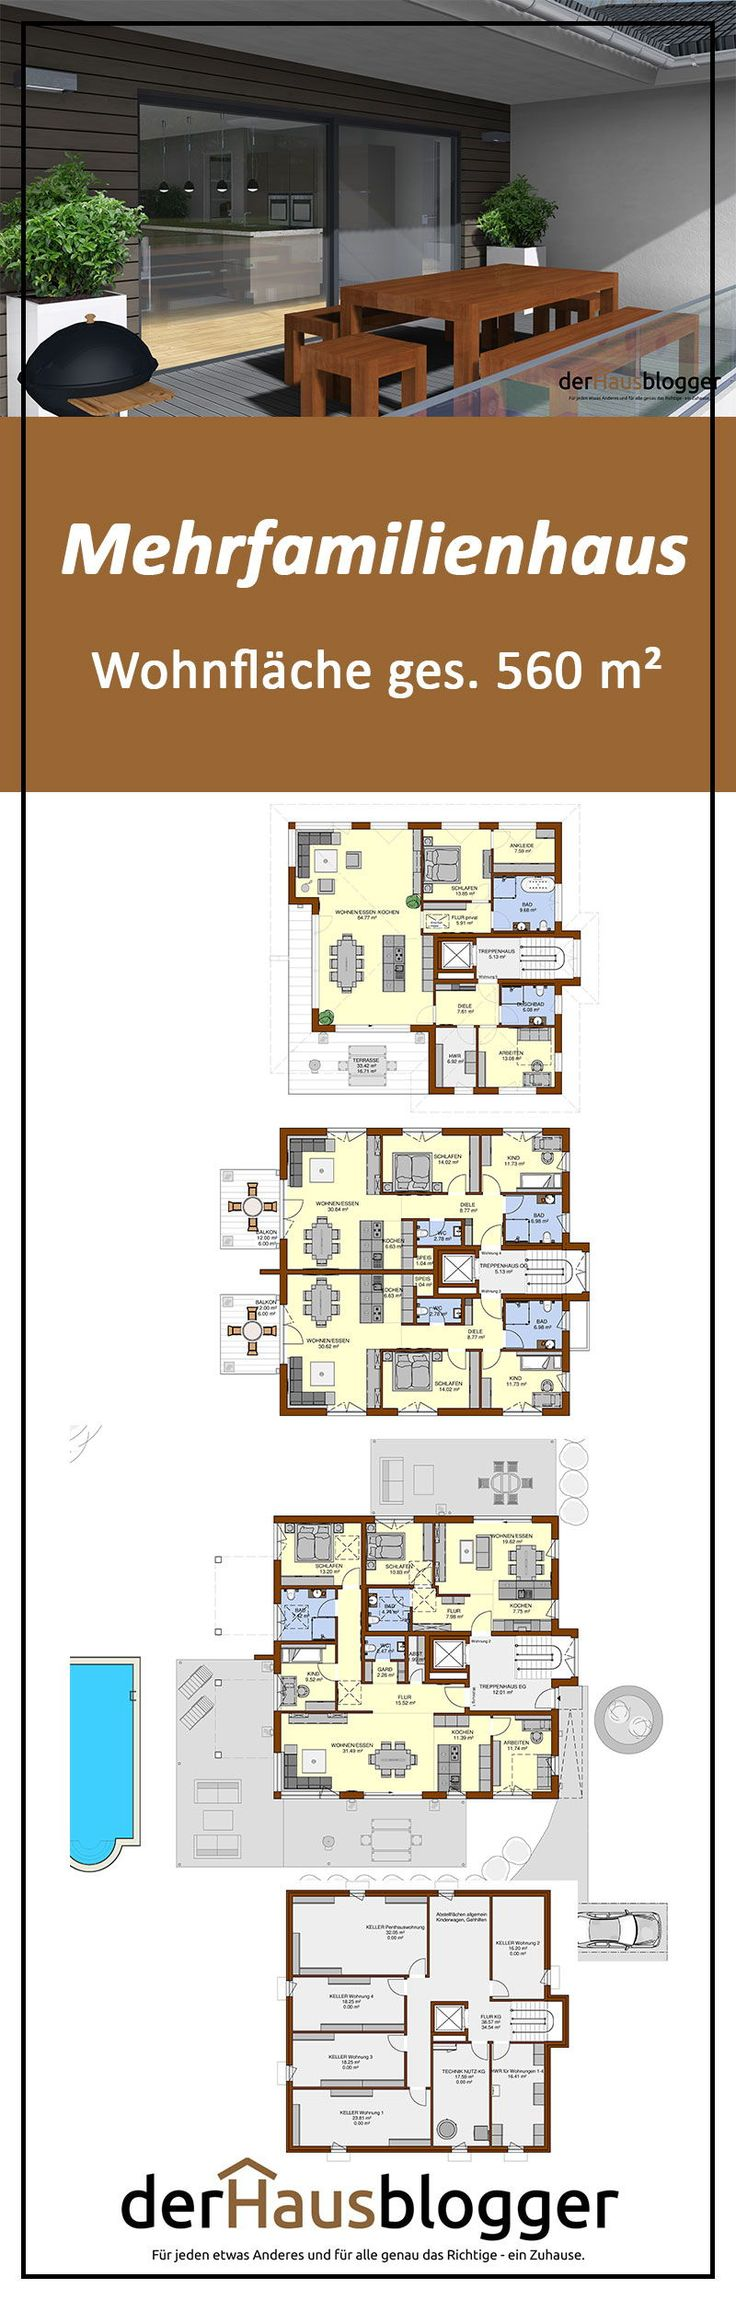 Mehrfamilienhaus 560m² Penthouse wohnung, Familien haus